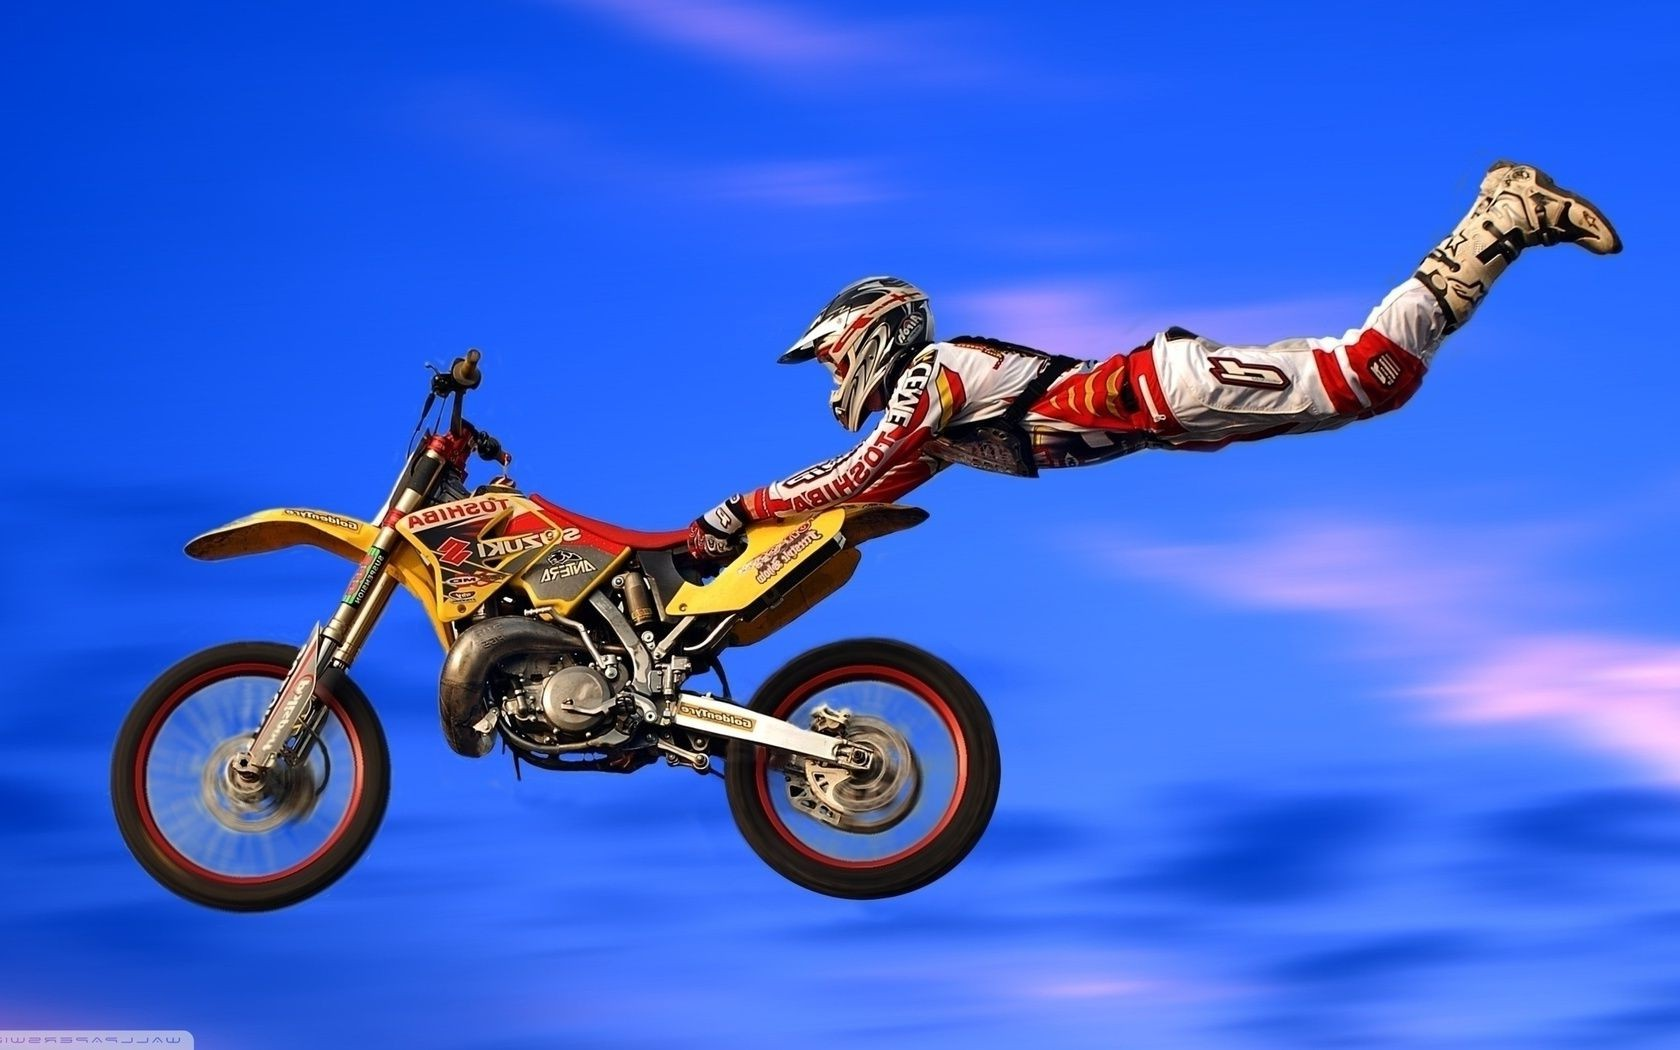 спорт мотоциклы бесплатно